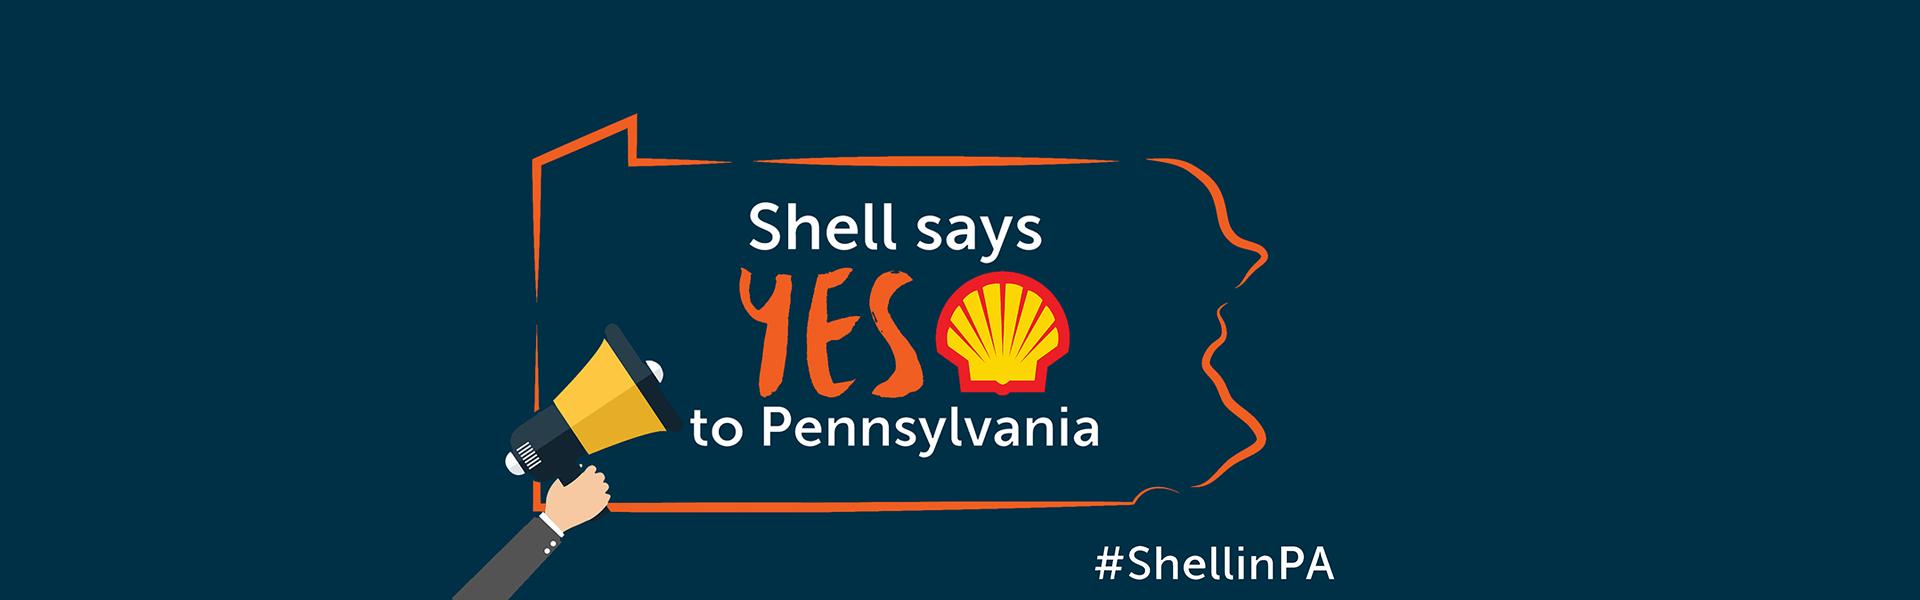 shell_yes_pa_1920x600